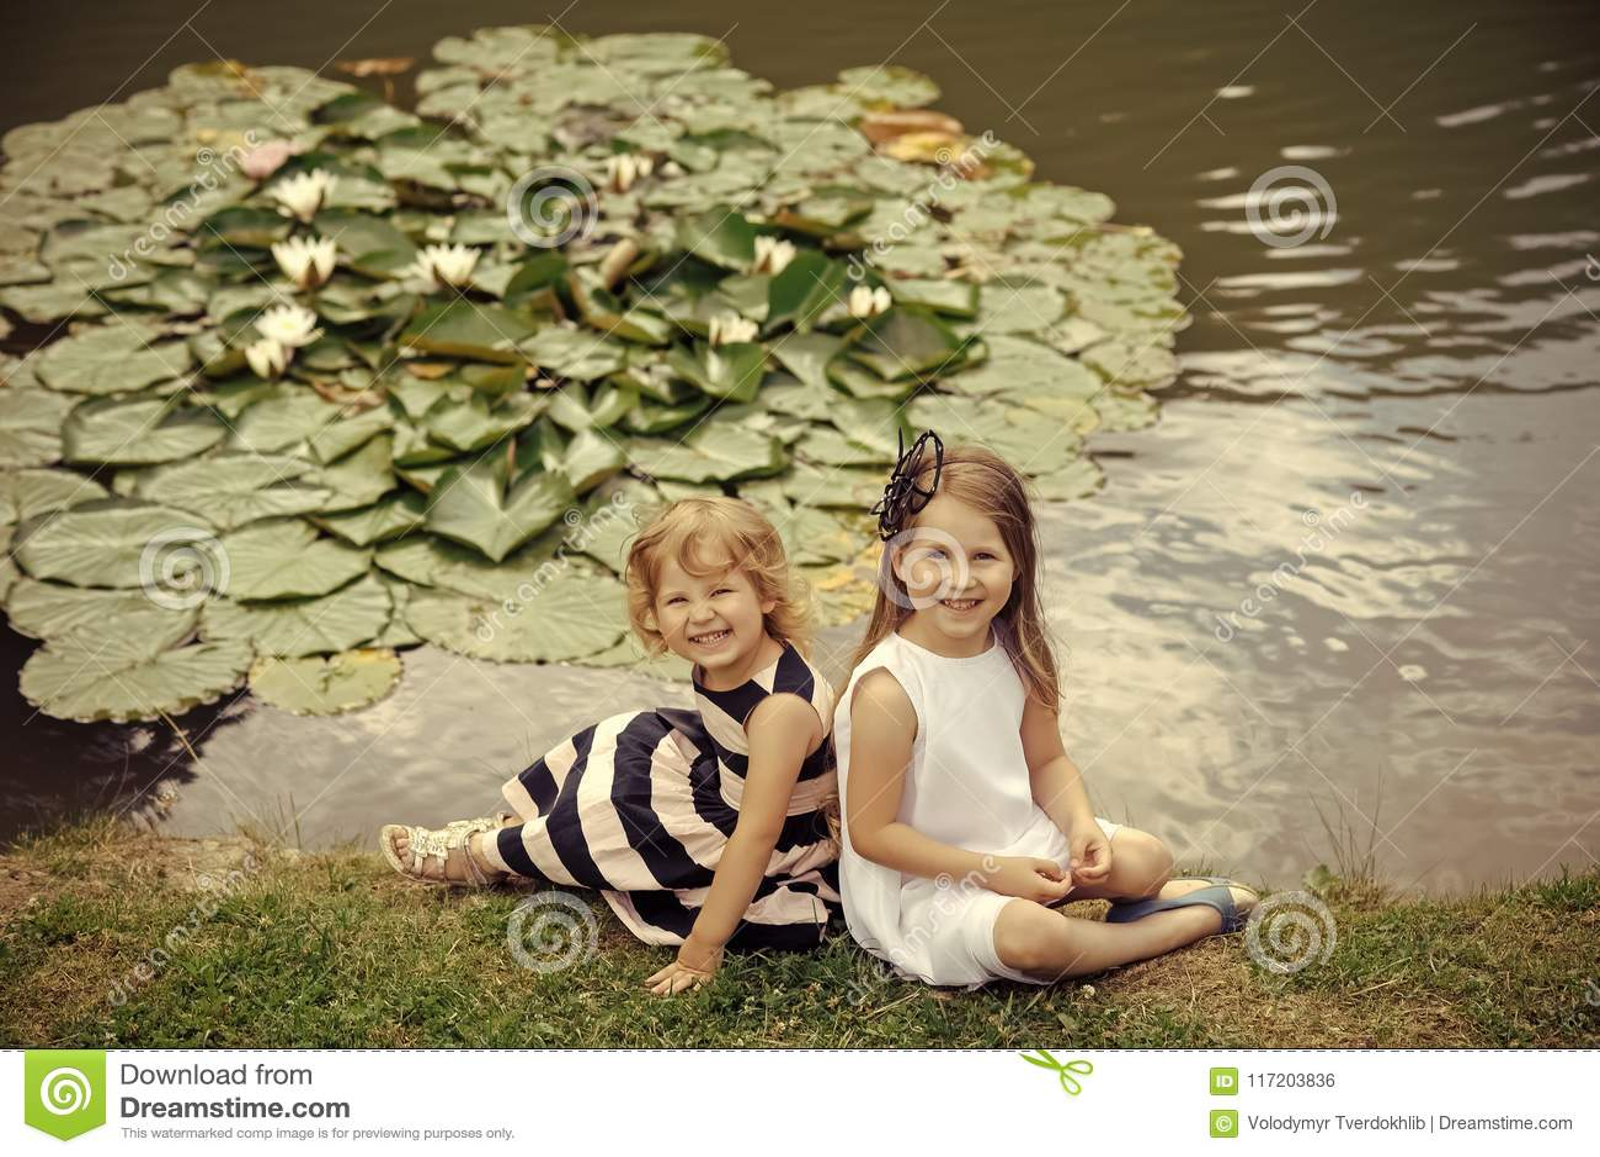 A plant that makes children happy 10